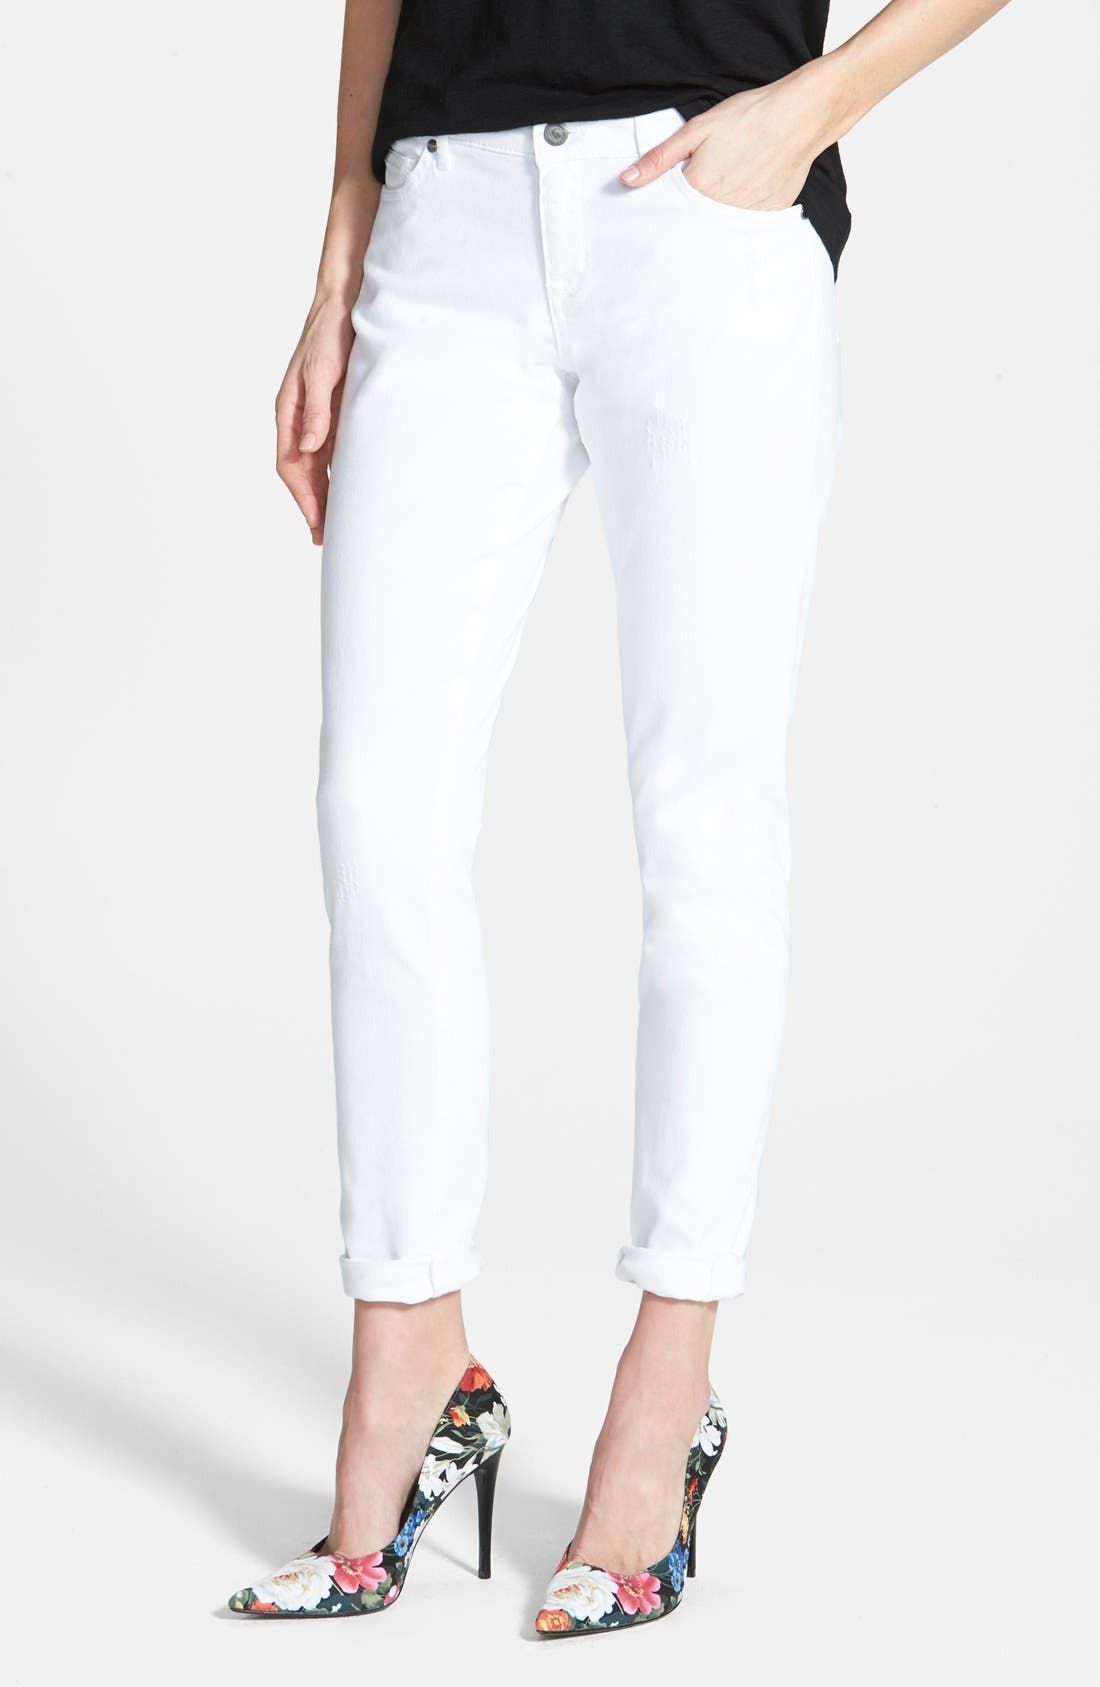 Alternate Image 1 Selected - CJ by Cookie Johnson 'Glory' Slim Boyfriend Jeans (Optic White)